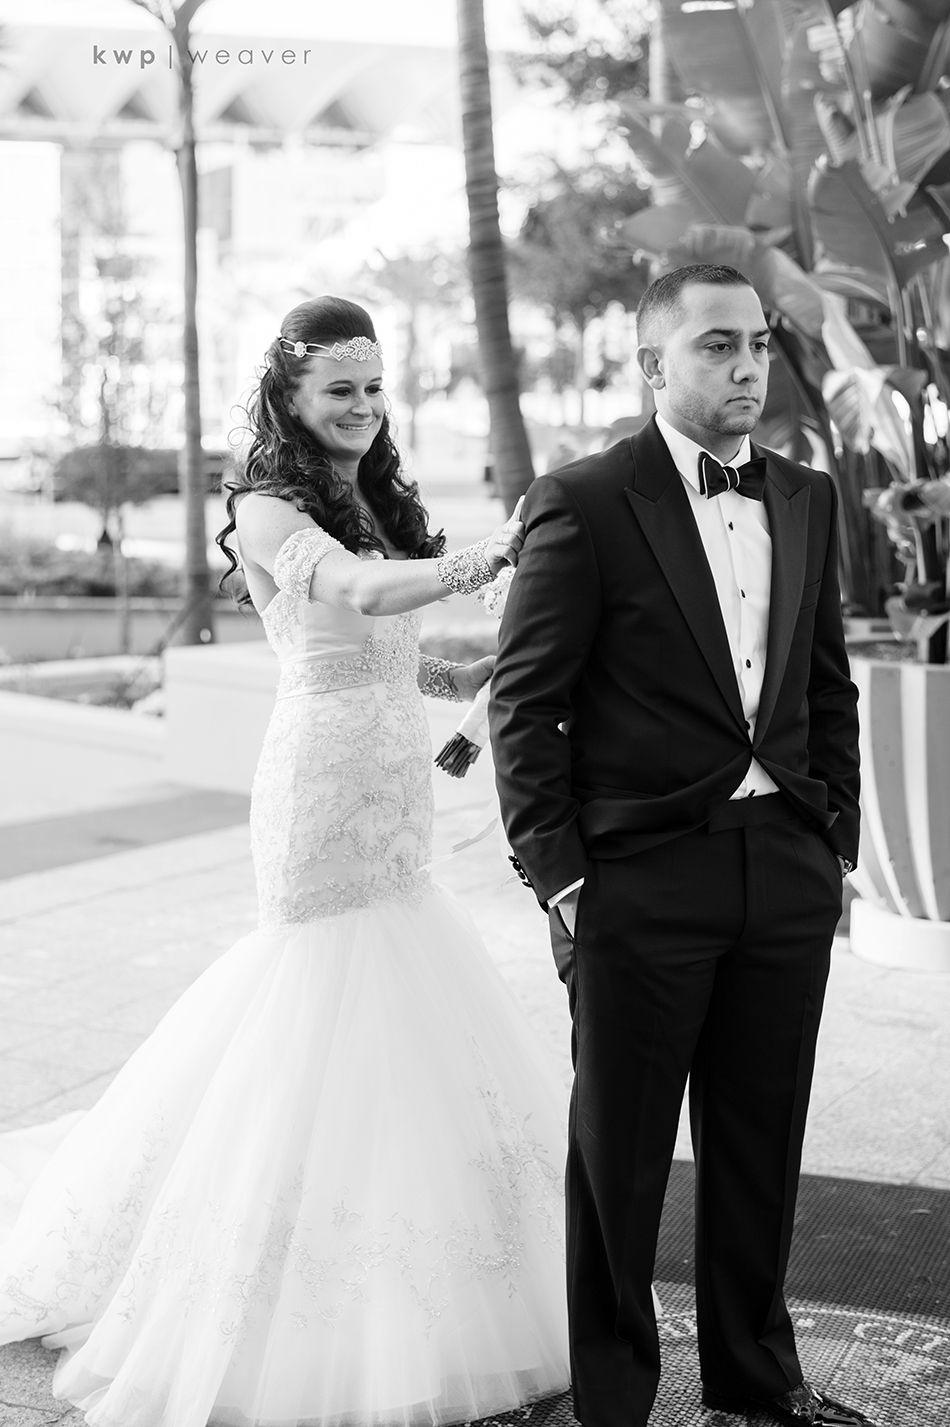 kristenweaver #wedding #firstlook | Levell Wedding 1.24.15 ...